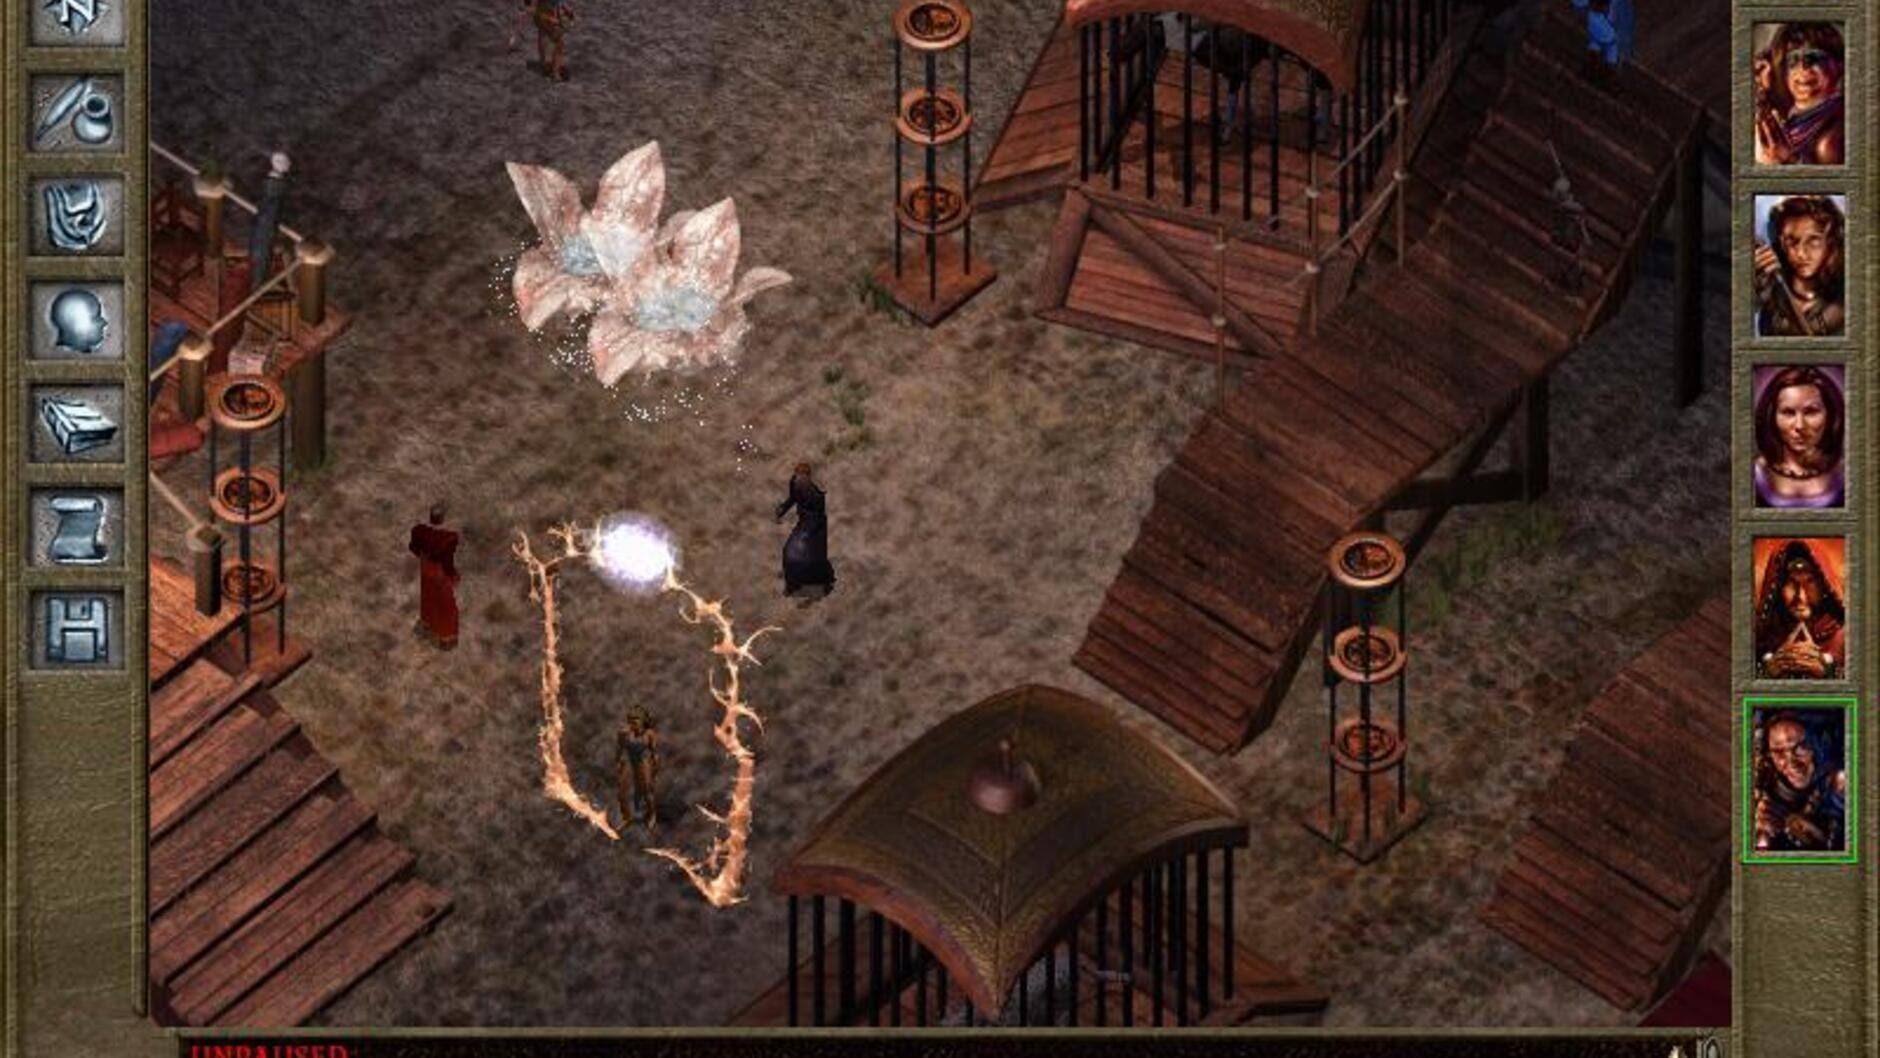 Baldur's Gate II: Shadows Of Amn - 1